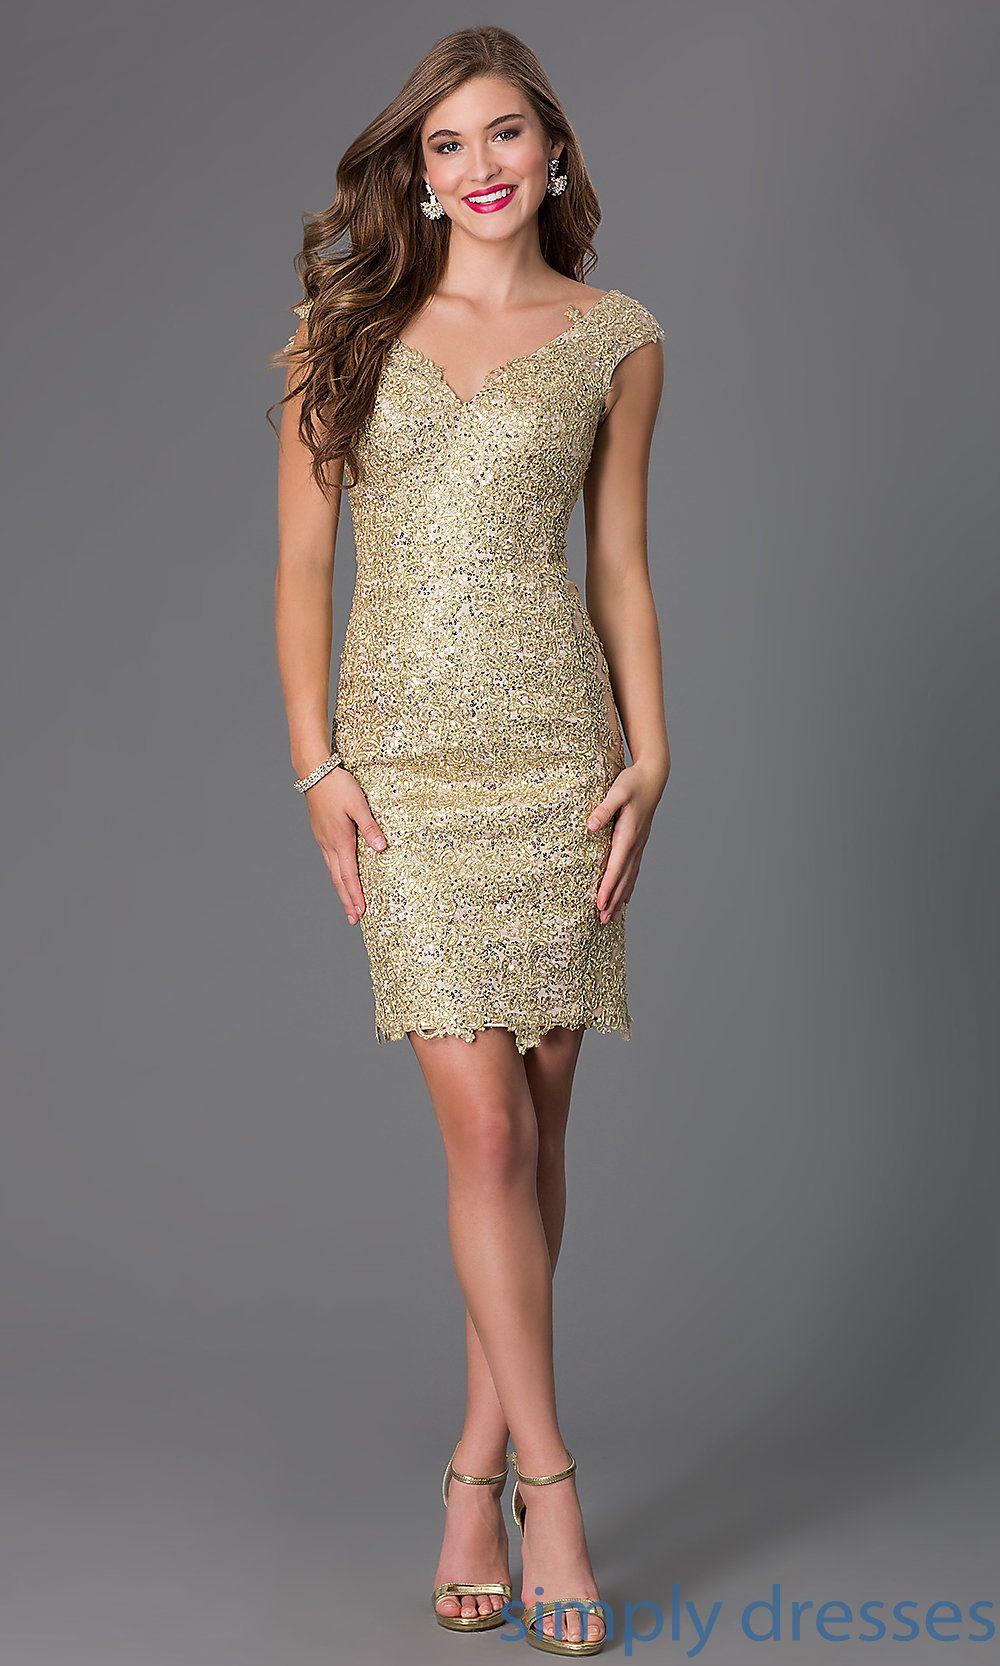 Short V Neck Lace And Sequin Dress Formal Dresses Short Short Dresses Formal Party Dress [ 1666 x 1000 Pixel ]